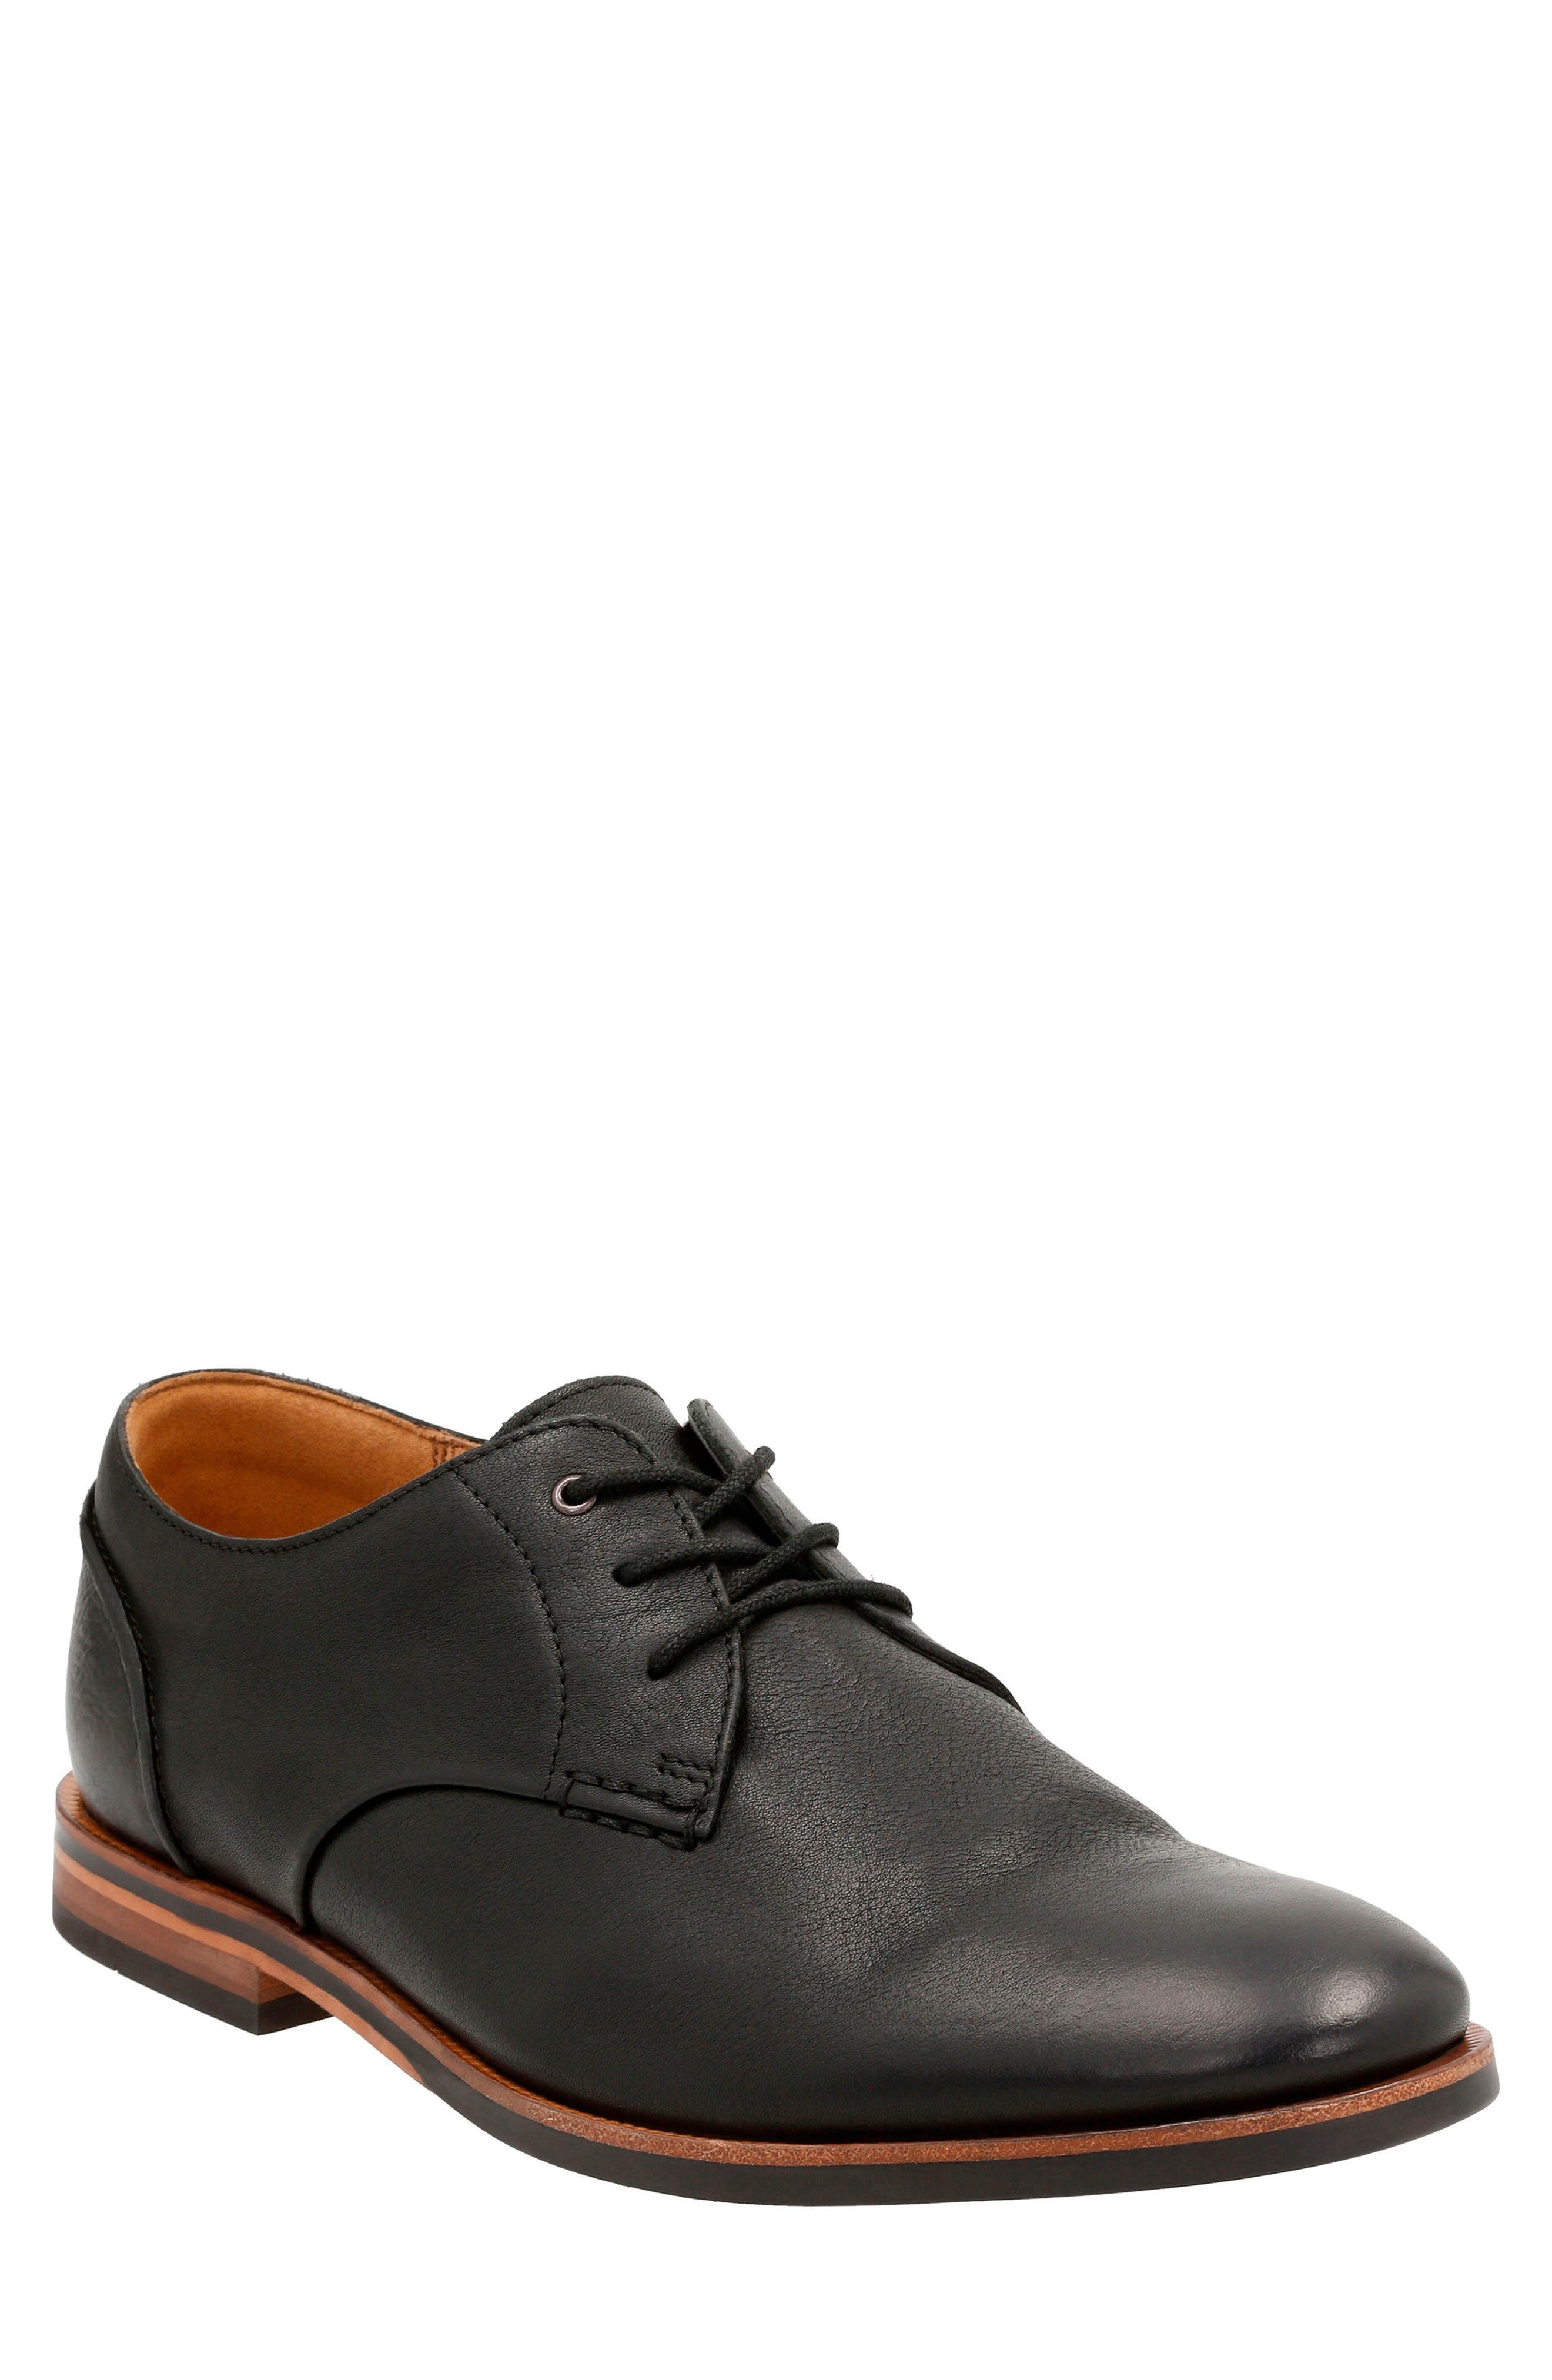 Main Image - Clarks® Broyd Walk Plain Toe Derby (Men)